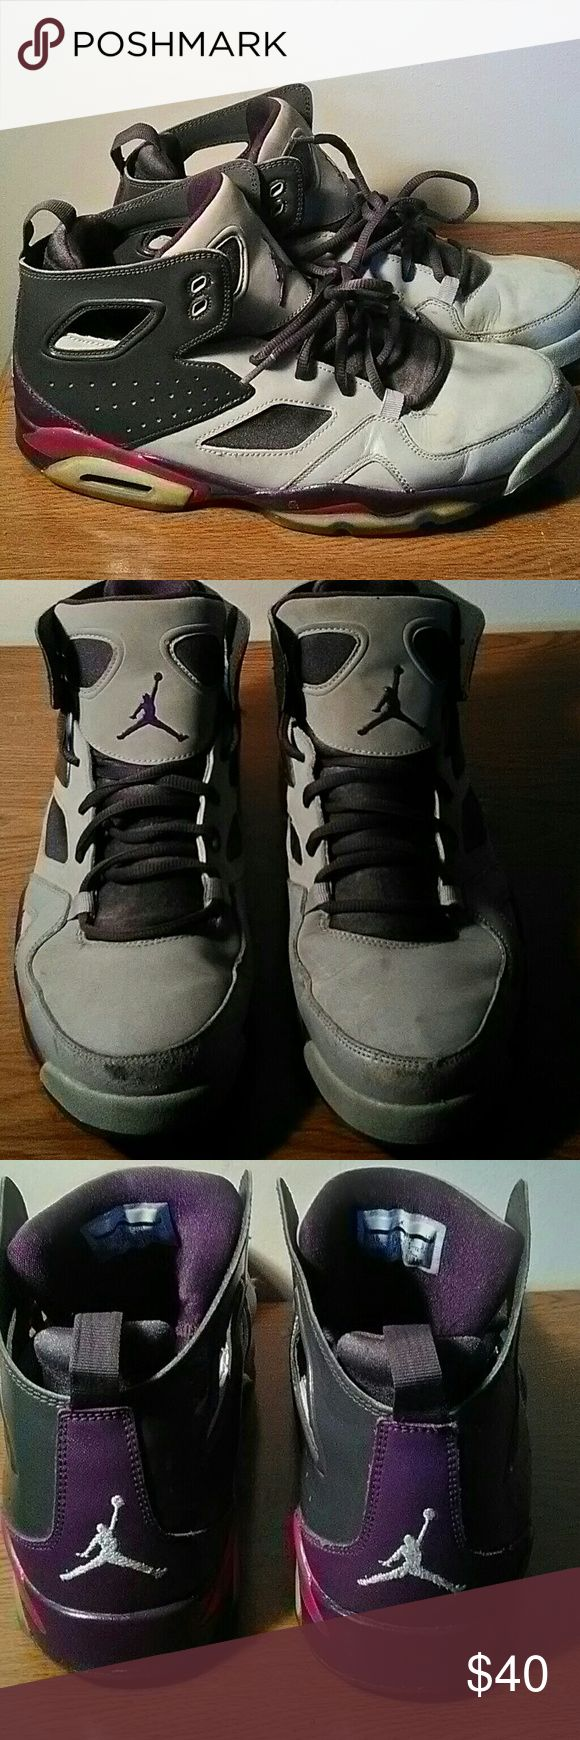 Nike Air Jordan Flight Club 91' Size 10 in good/fair condition. Some wear on toe area. Jordan Shoes